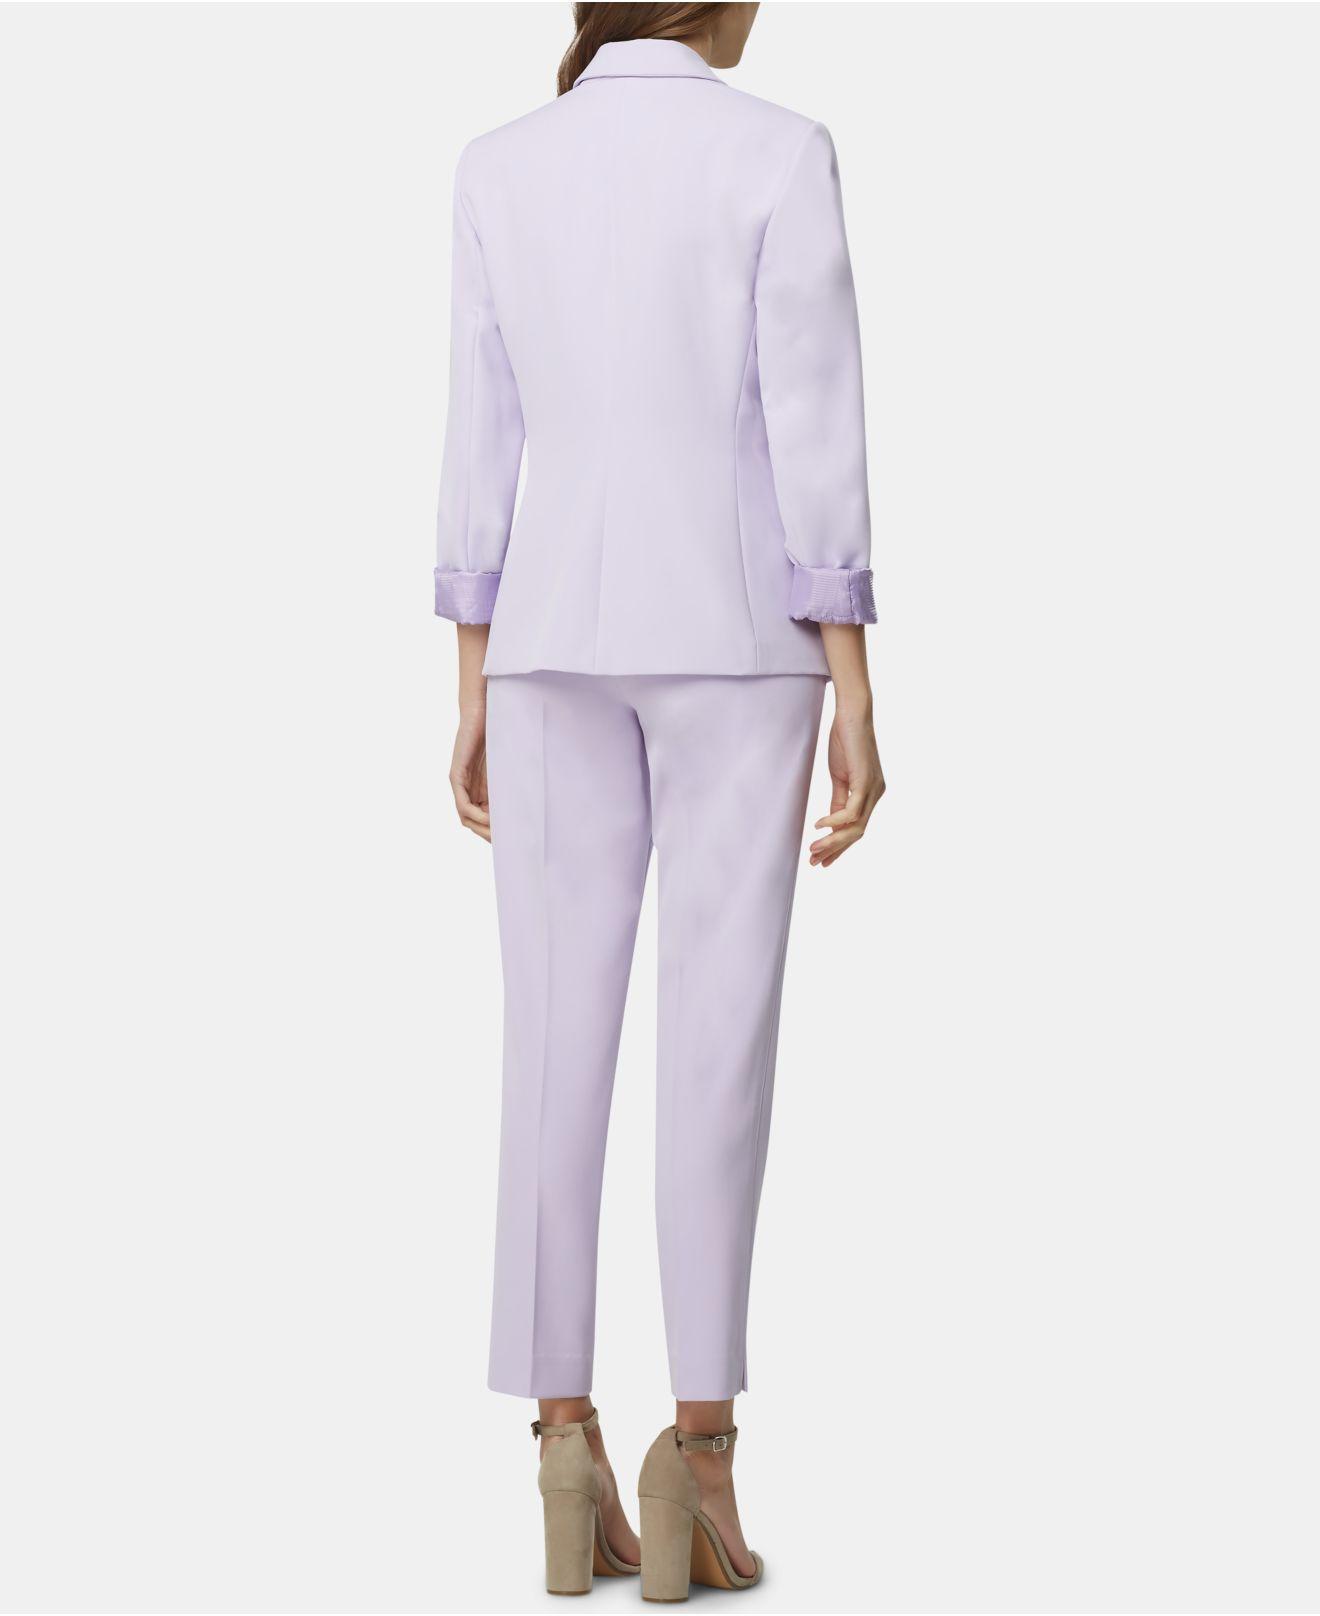 b31e1709926 Lyst - Tahari Notch-lapel Cuffed-sleeve Blazer in Purple